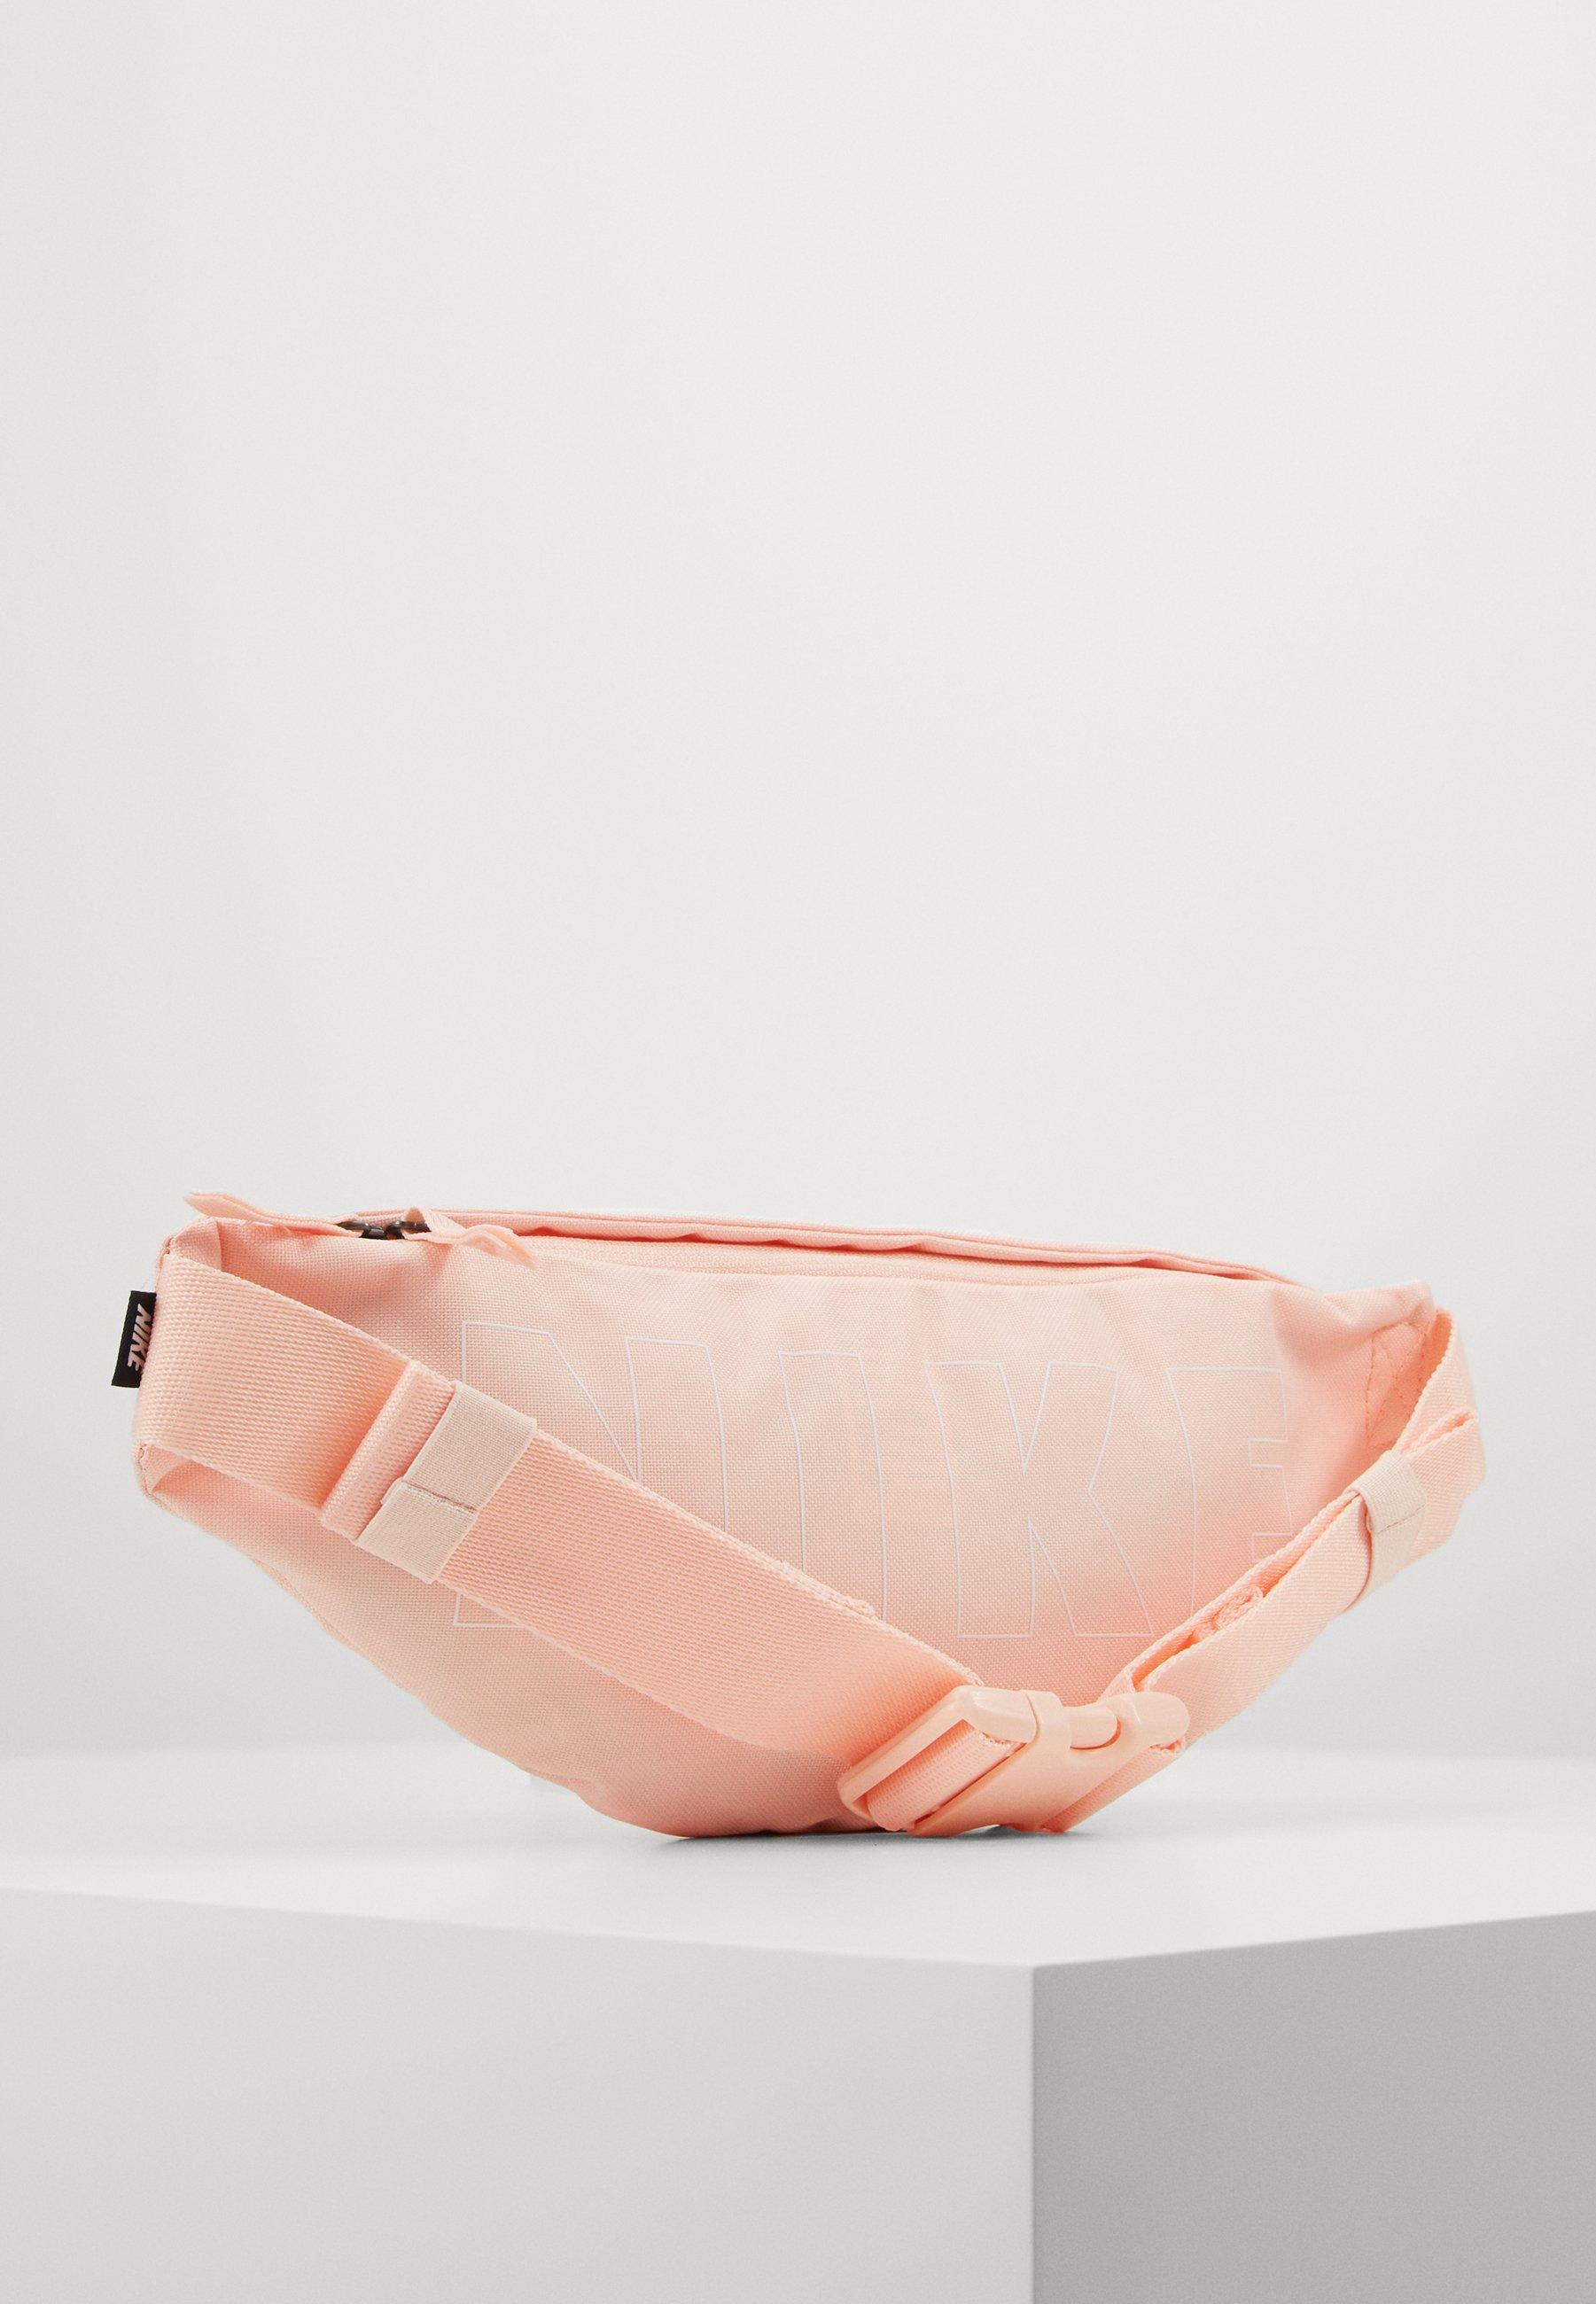 Nike Sportswear HERITAGE HIP PACK - Rumpetaske - washed coral/white/rød FVfSG5bK2DSOkUc